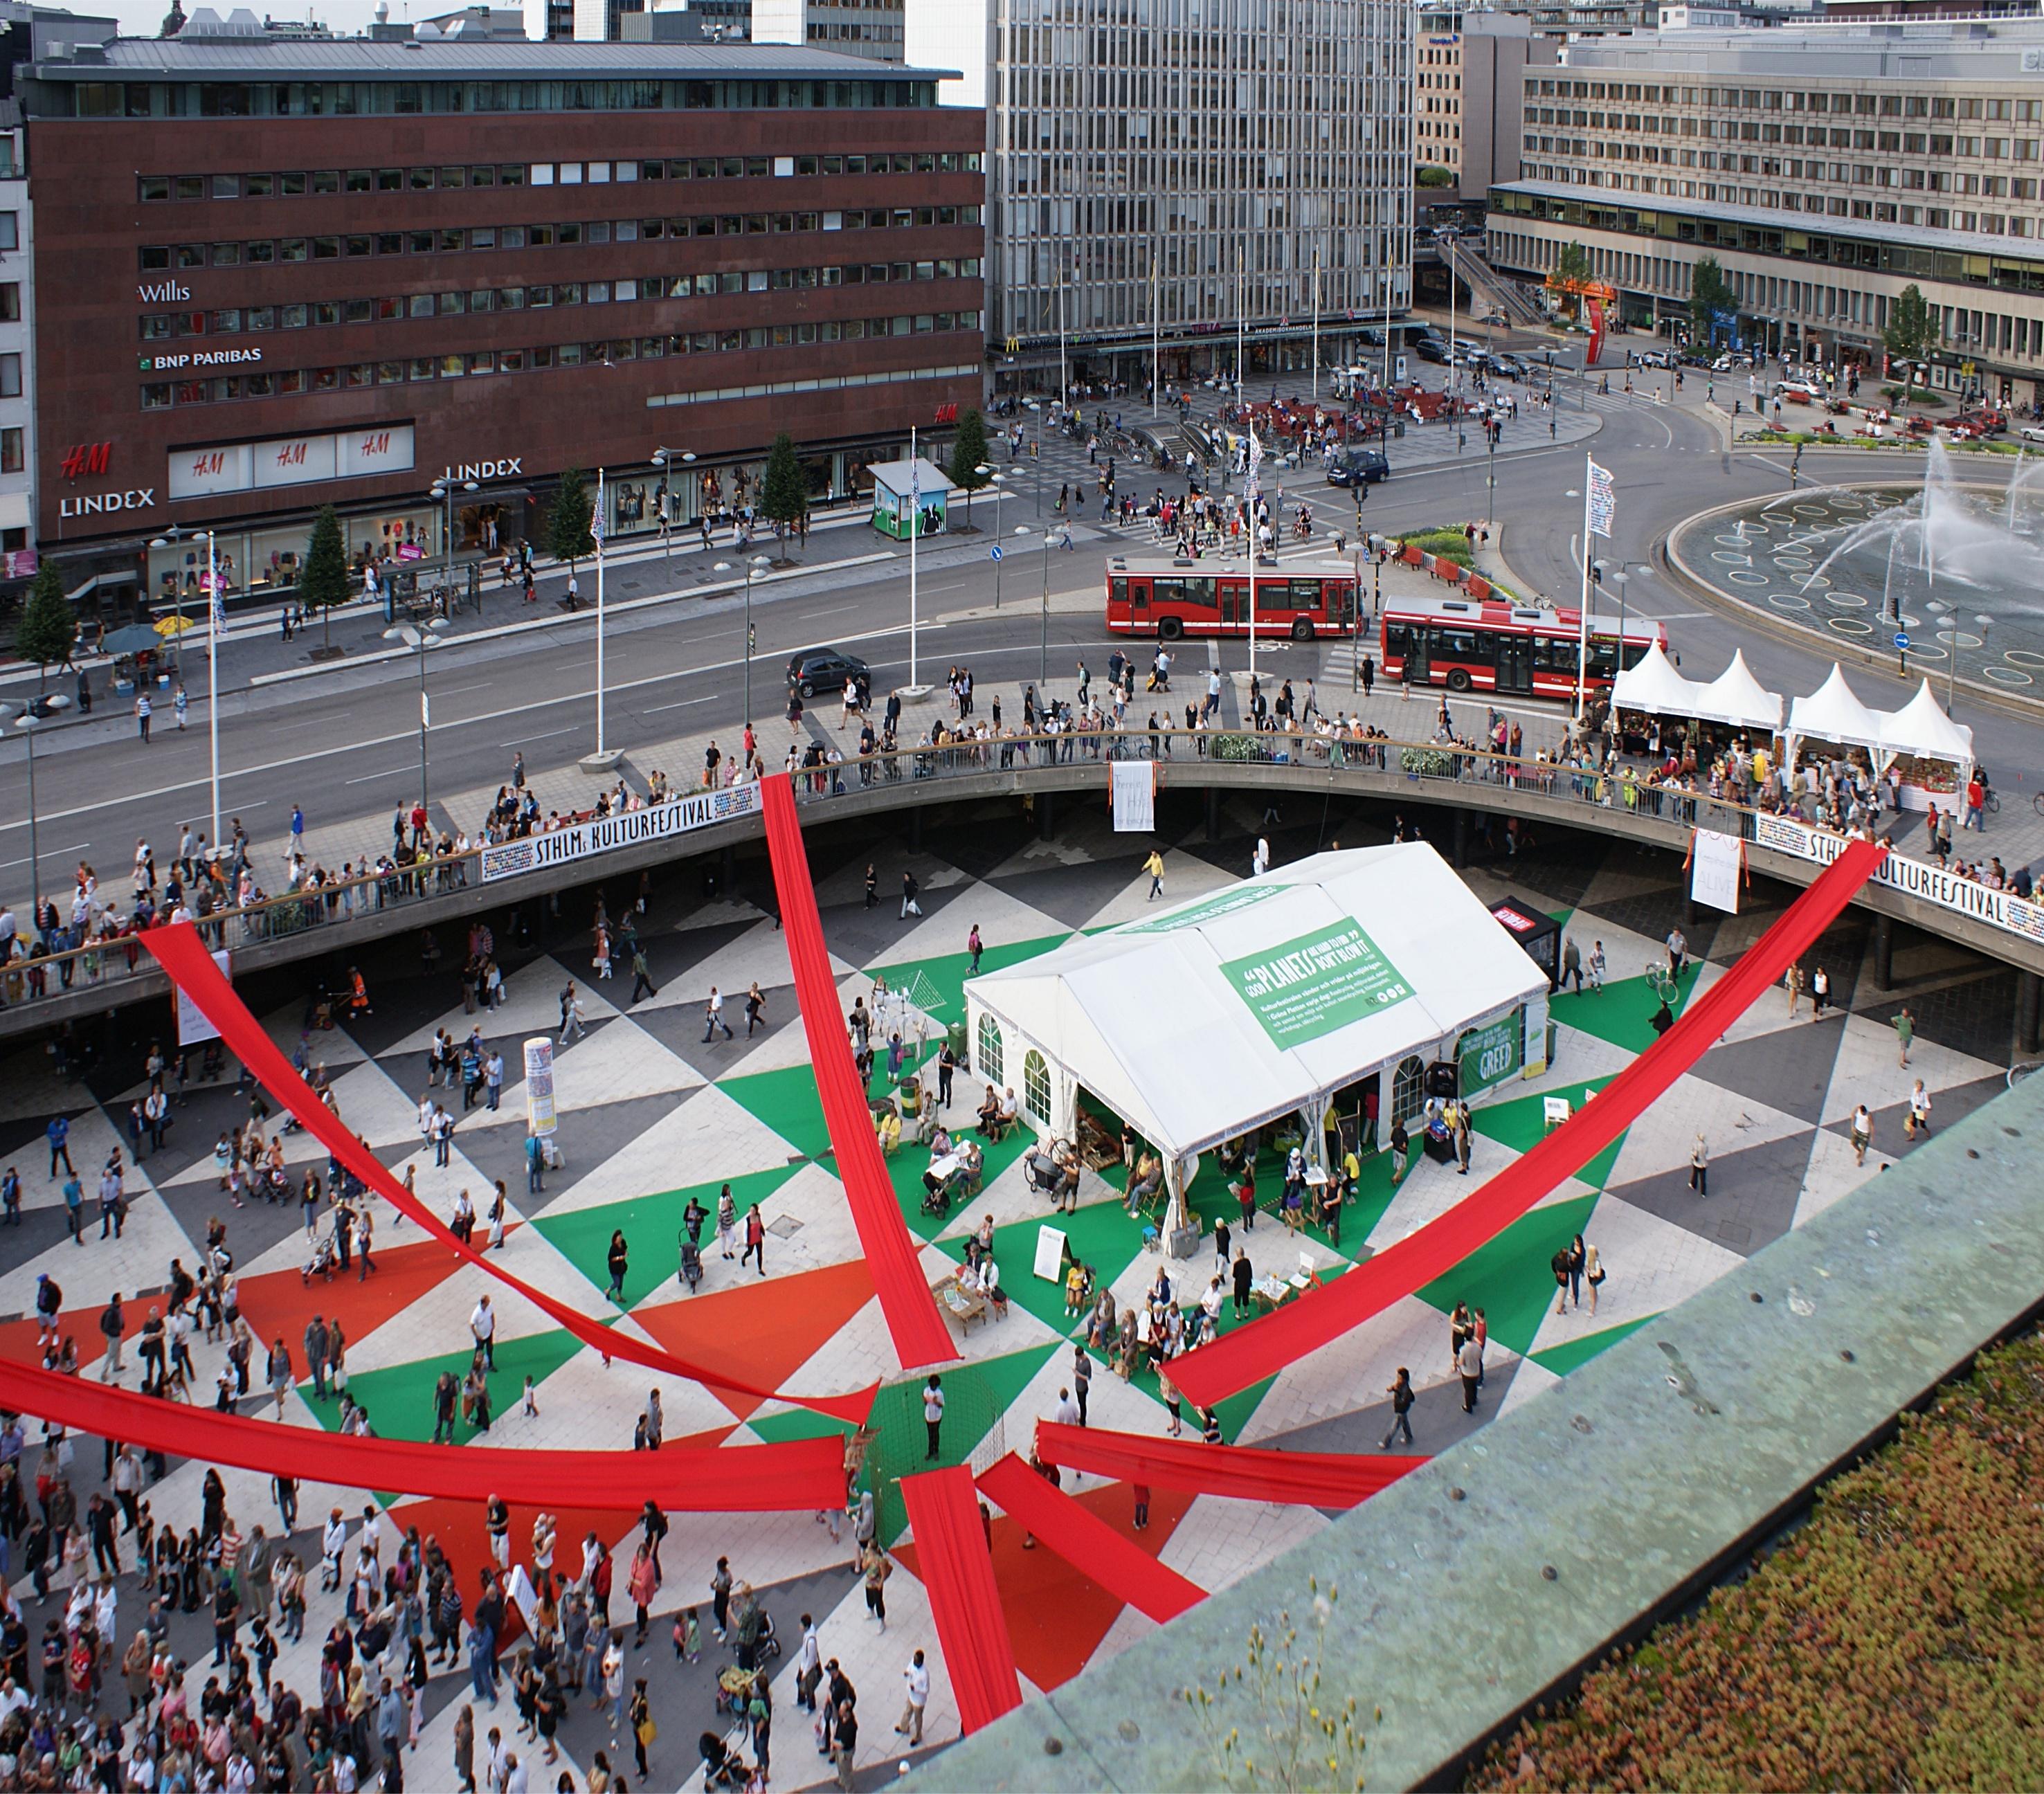 0898369d62d File:Stockholms Kulturfestival Sergels torg - 3.JPG - Wikimedia Commons